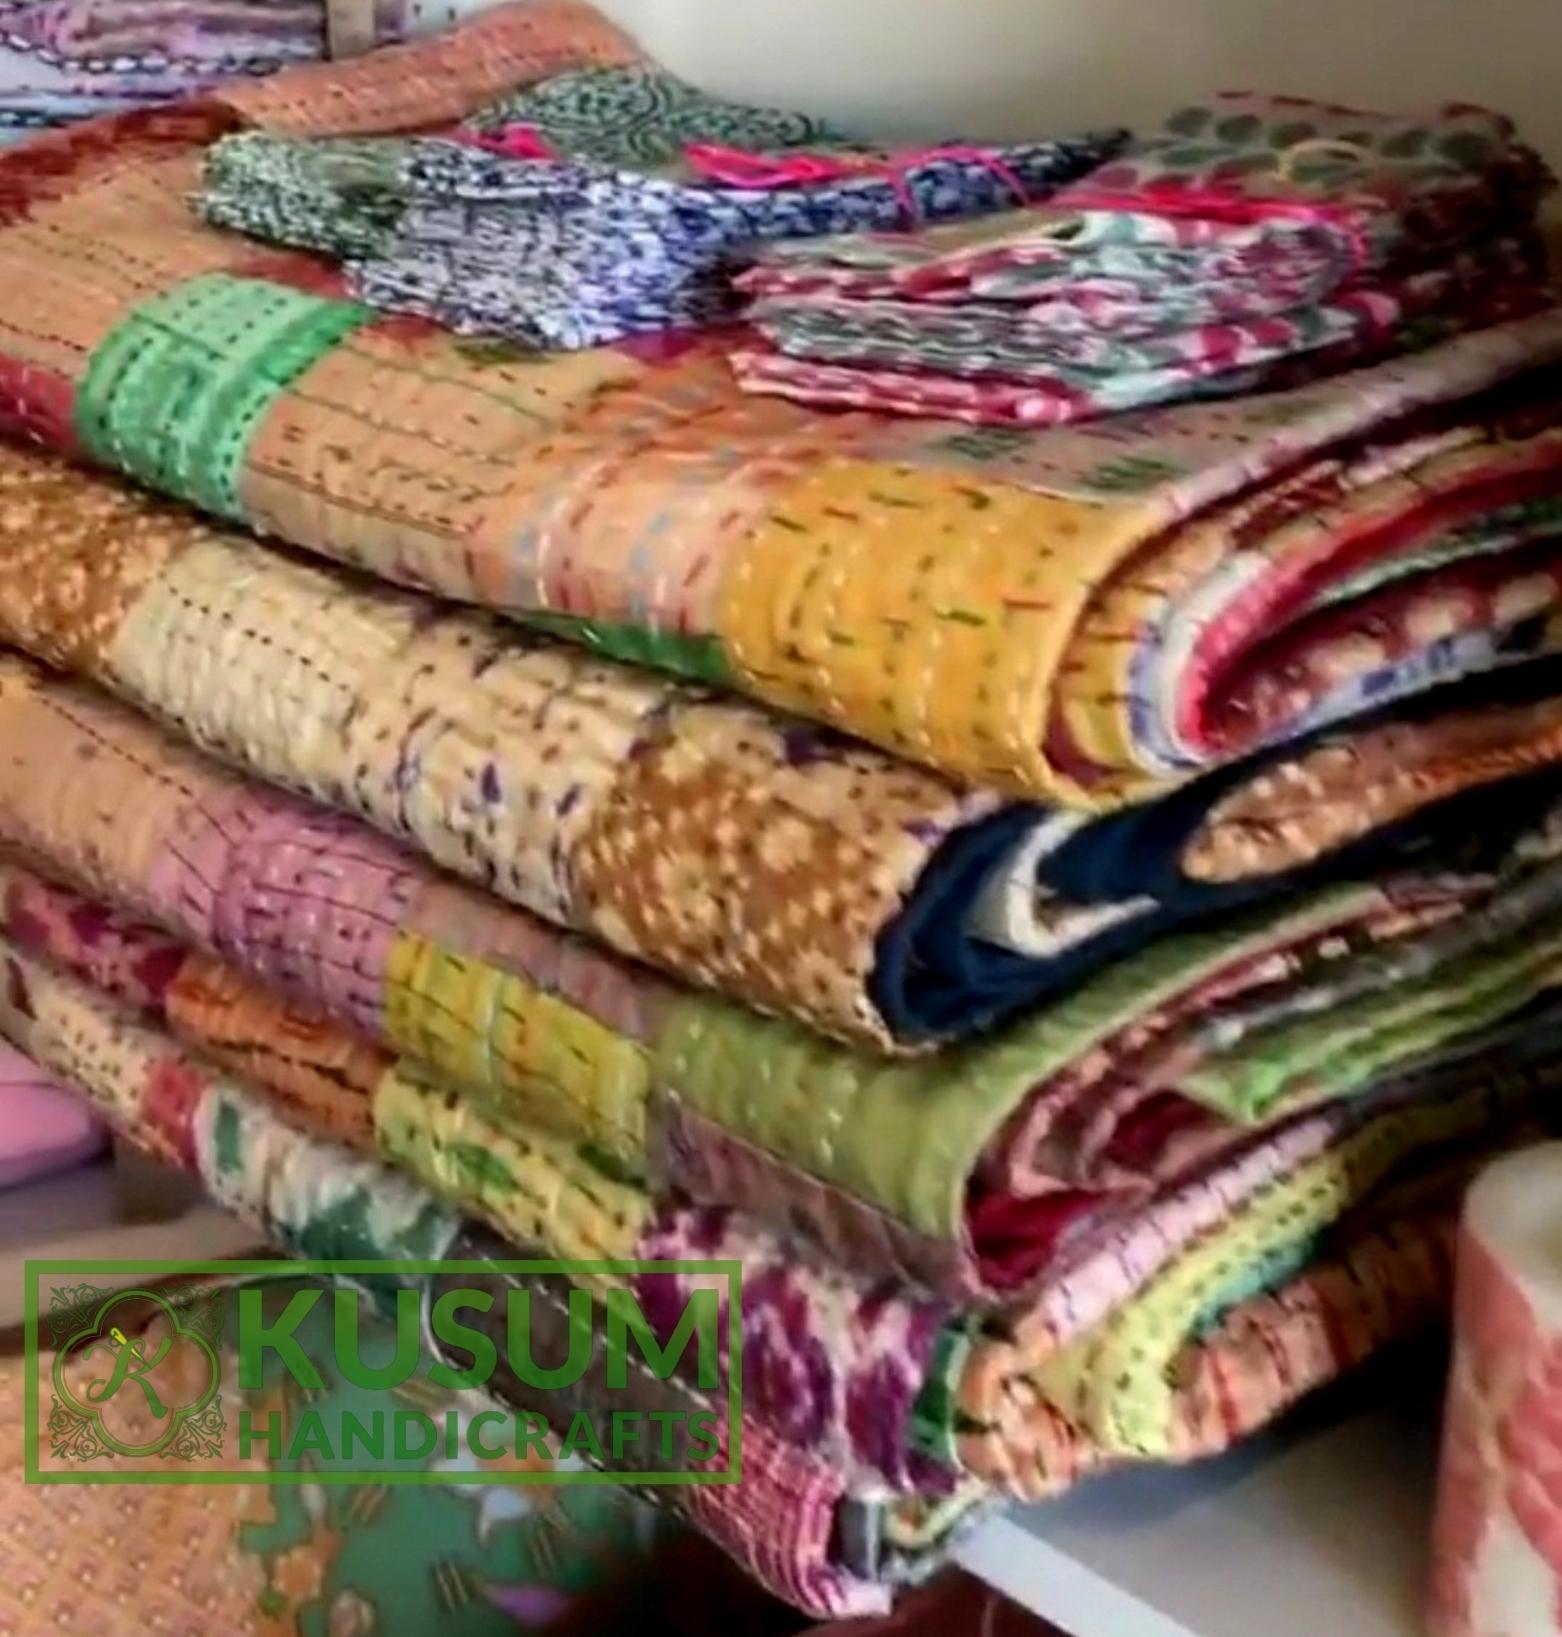 silkpatchworkquilt-kusumhandicrafts-kanthapatchworkpatolabedcover-kusumhandicrafts